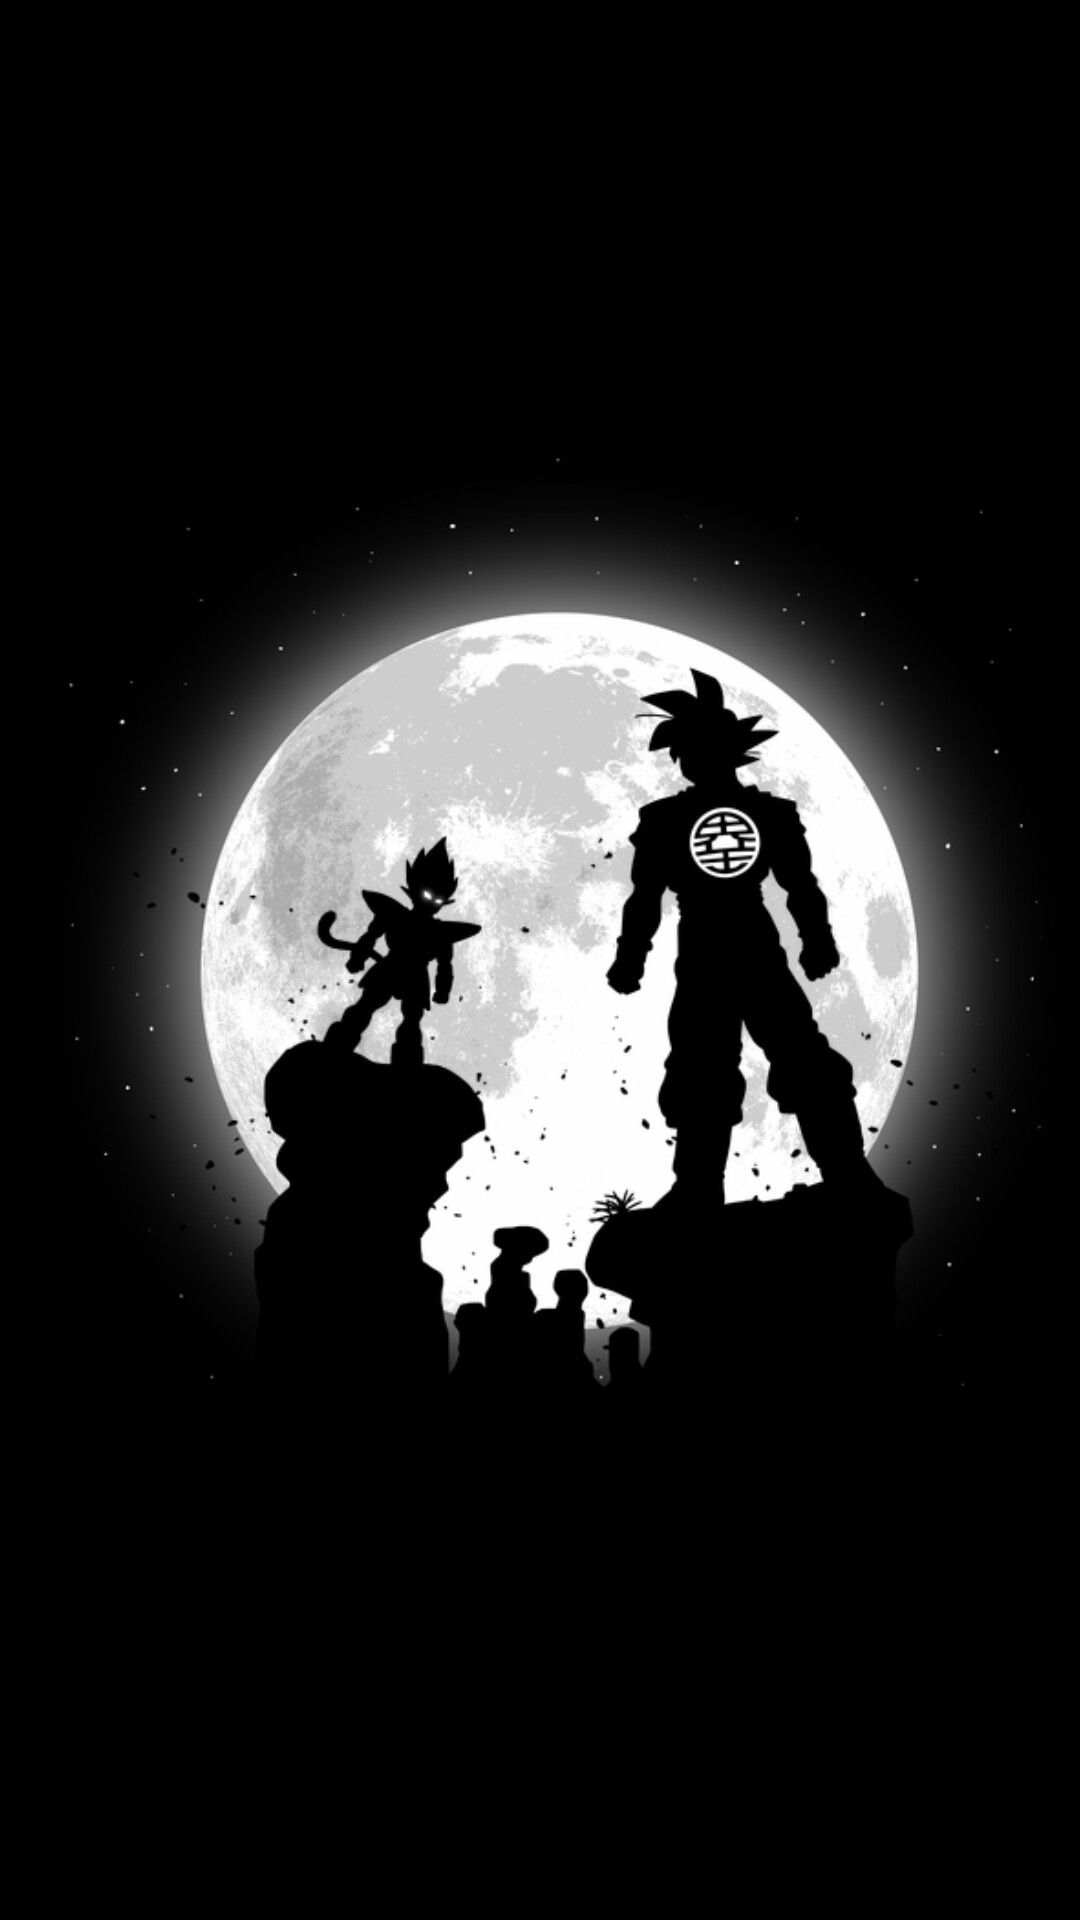 Wallpaper iphone vegeta - Goku Vs Vegeta